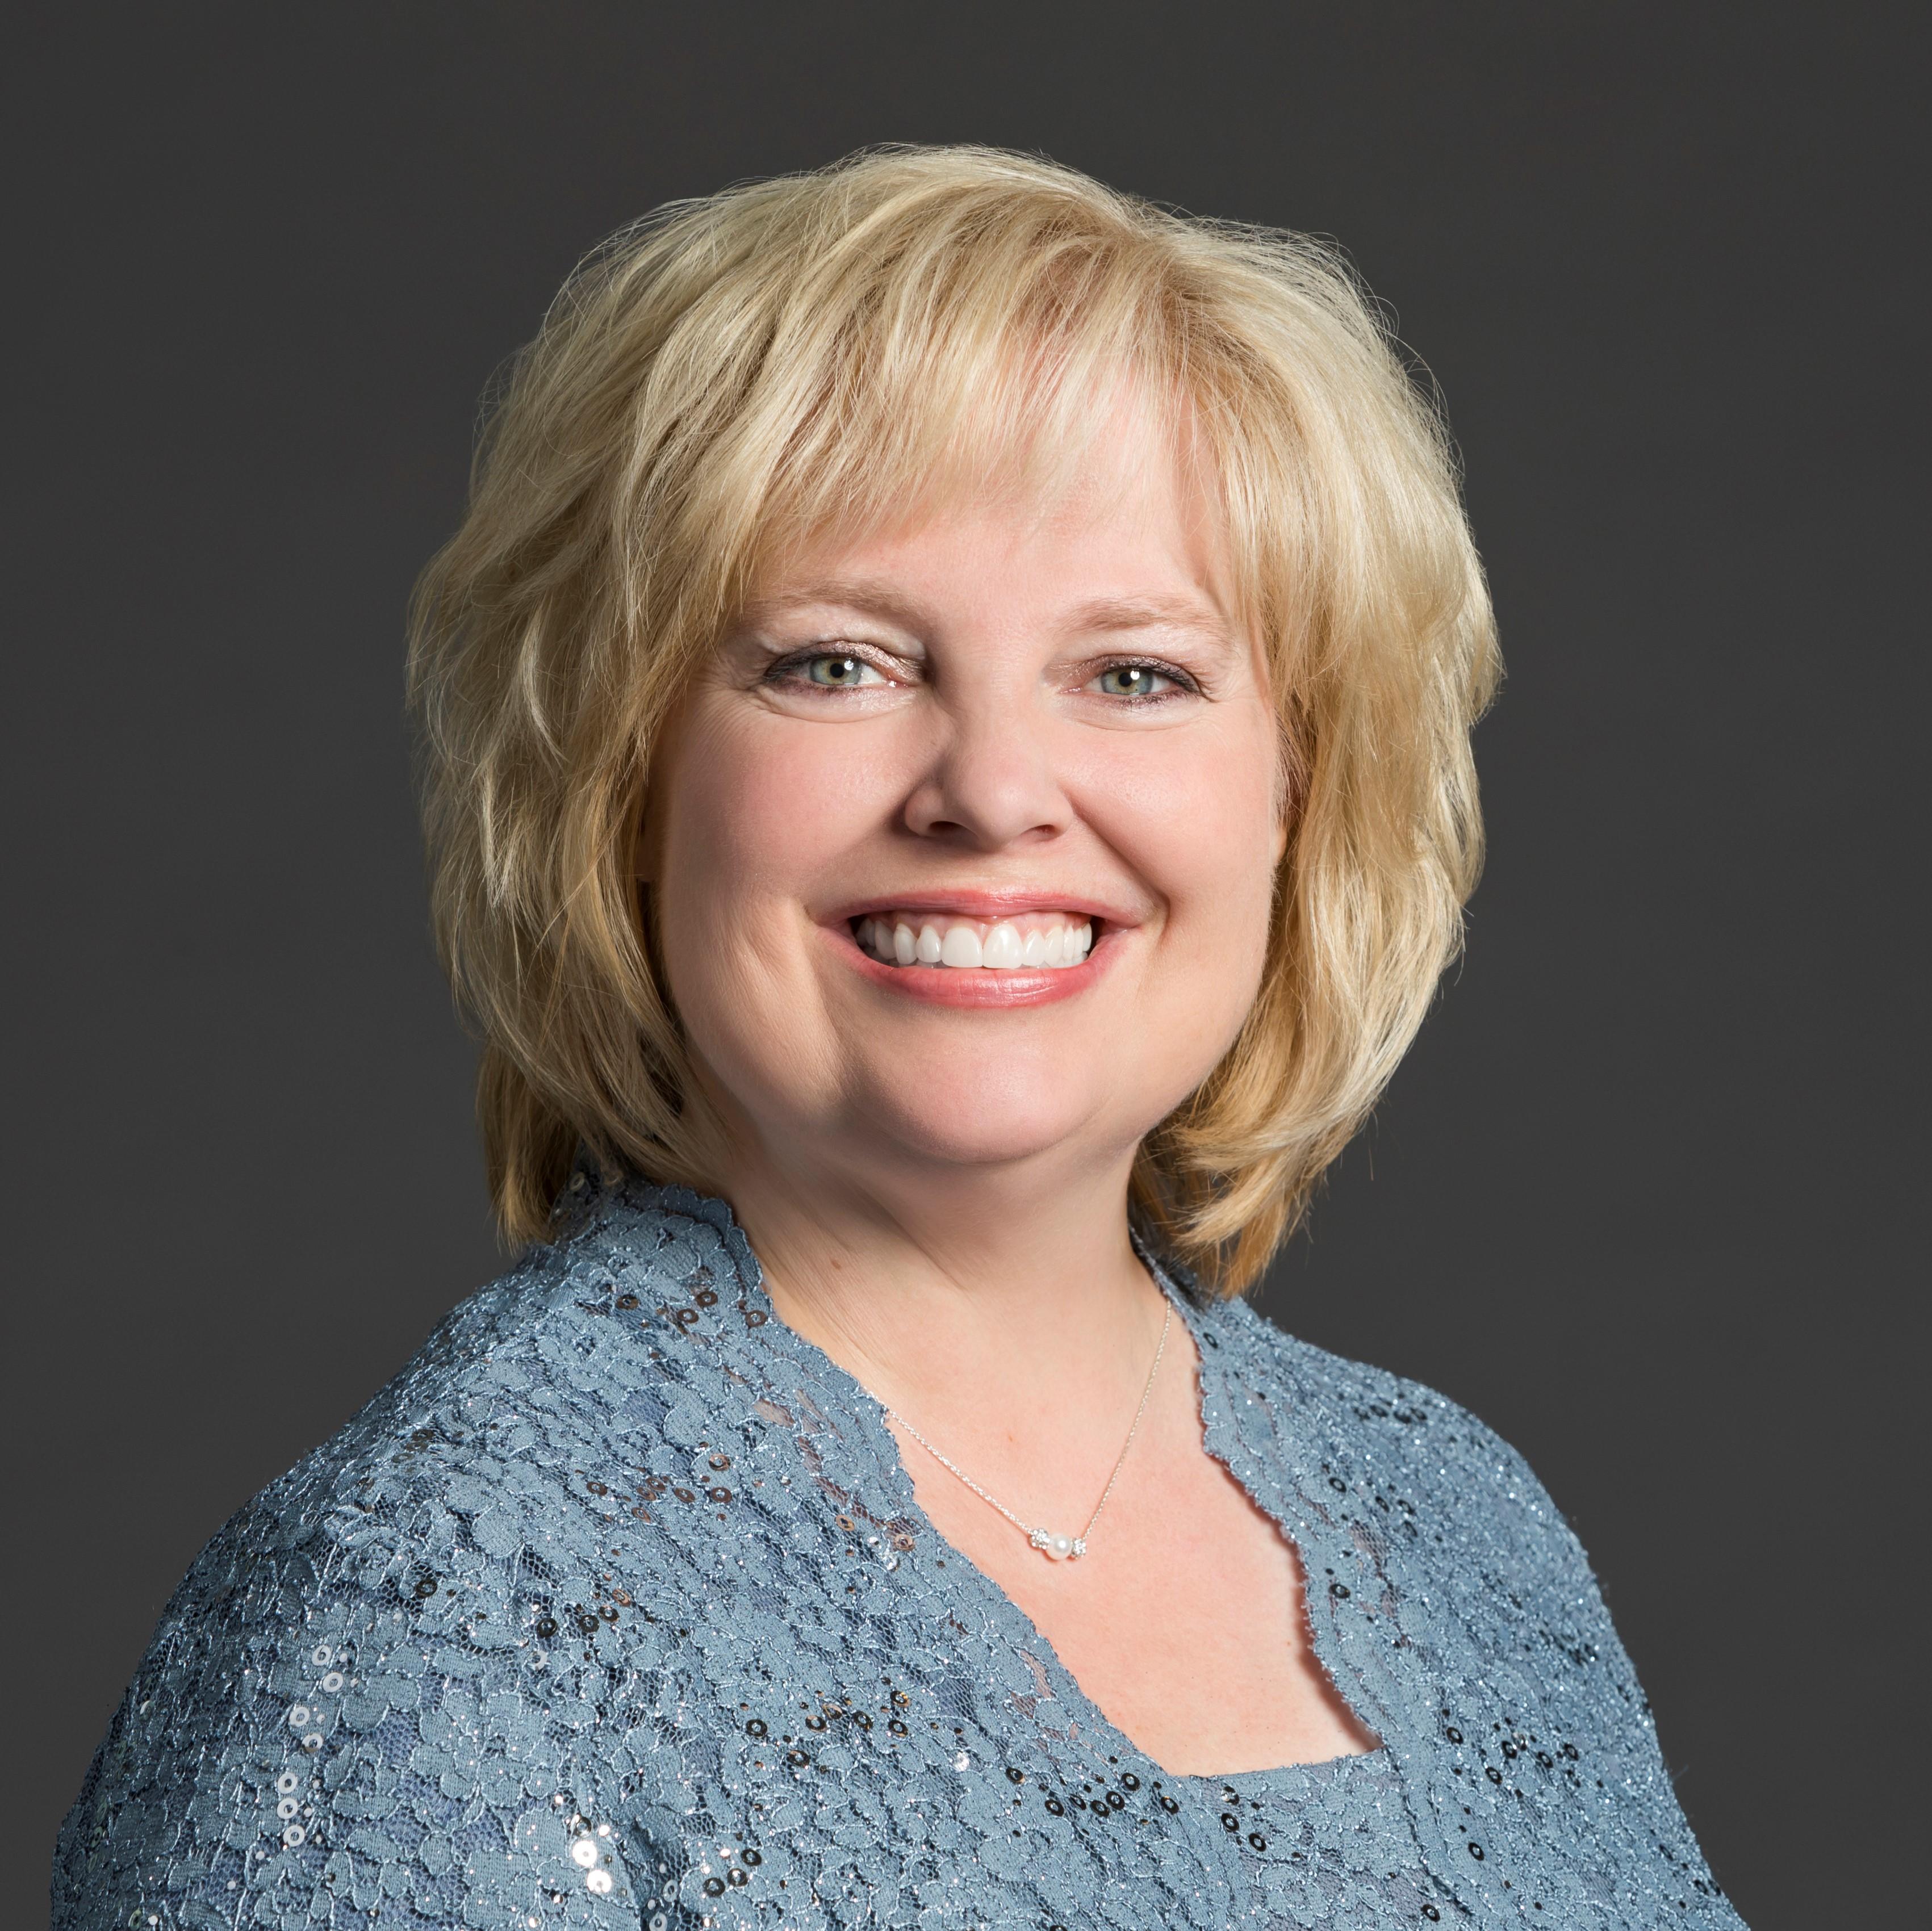 Melissa Coombs